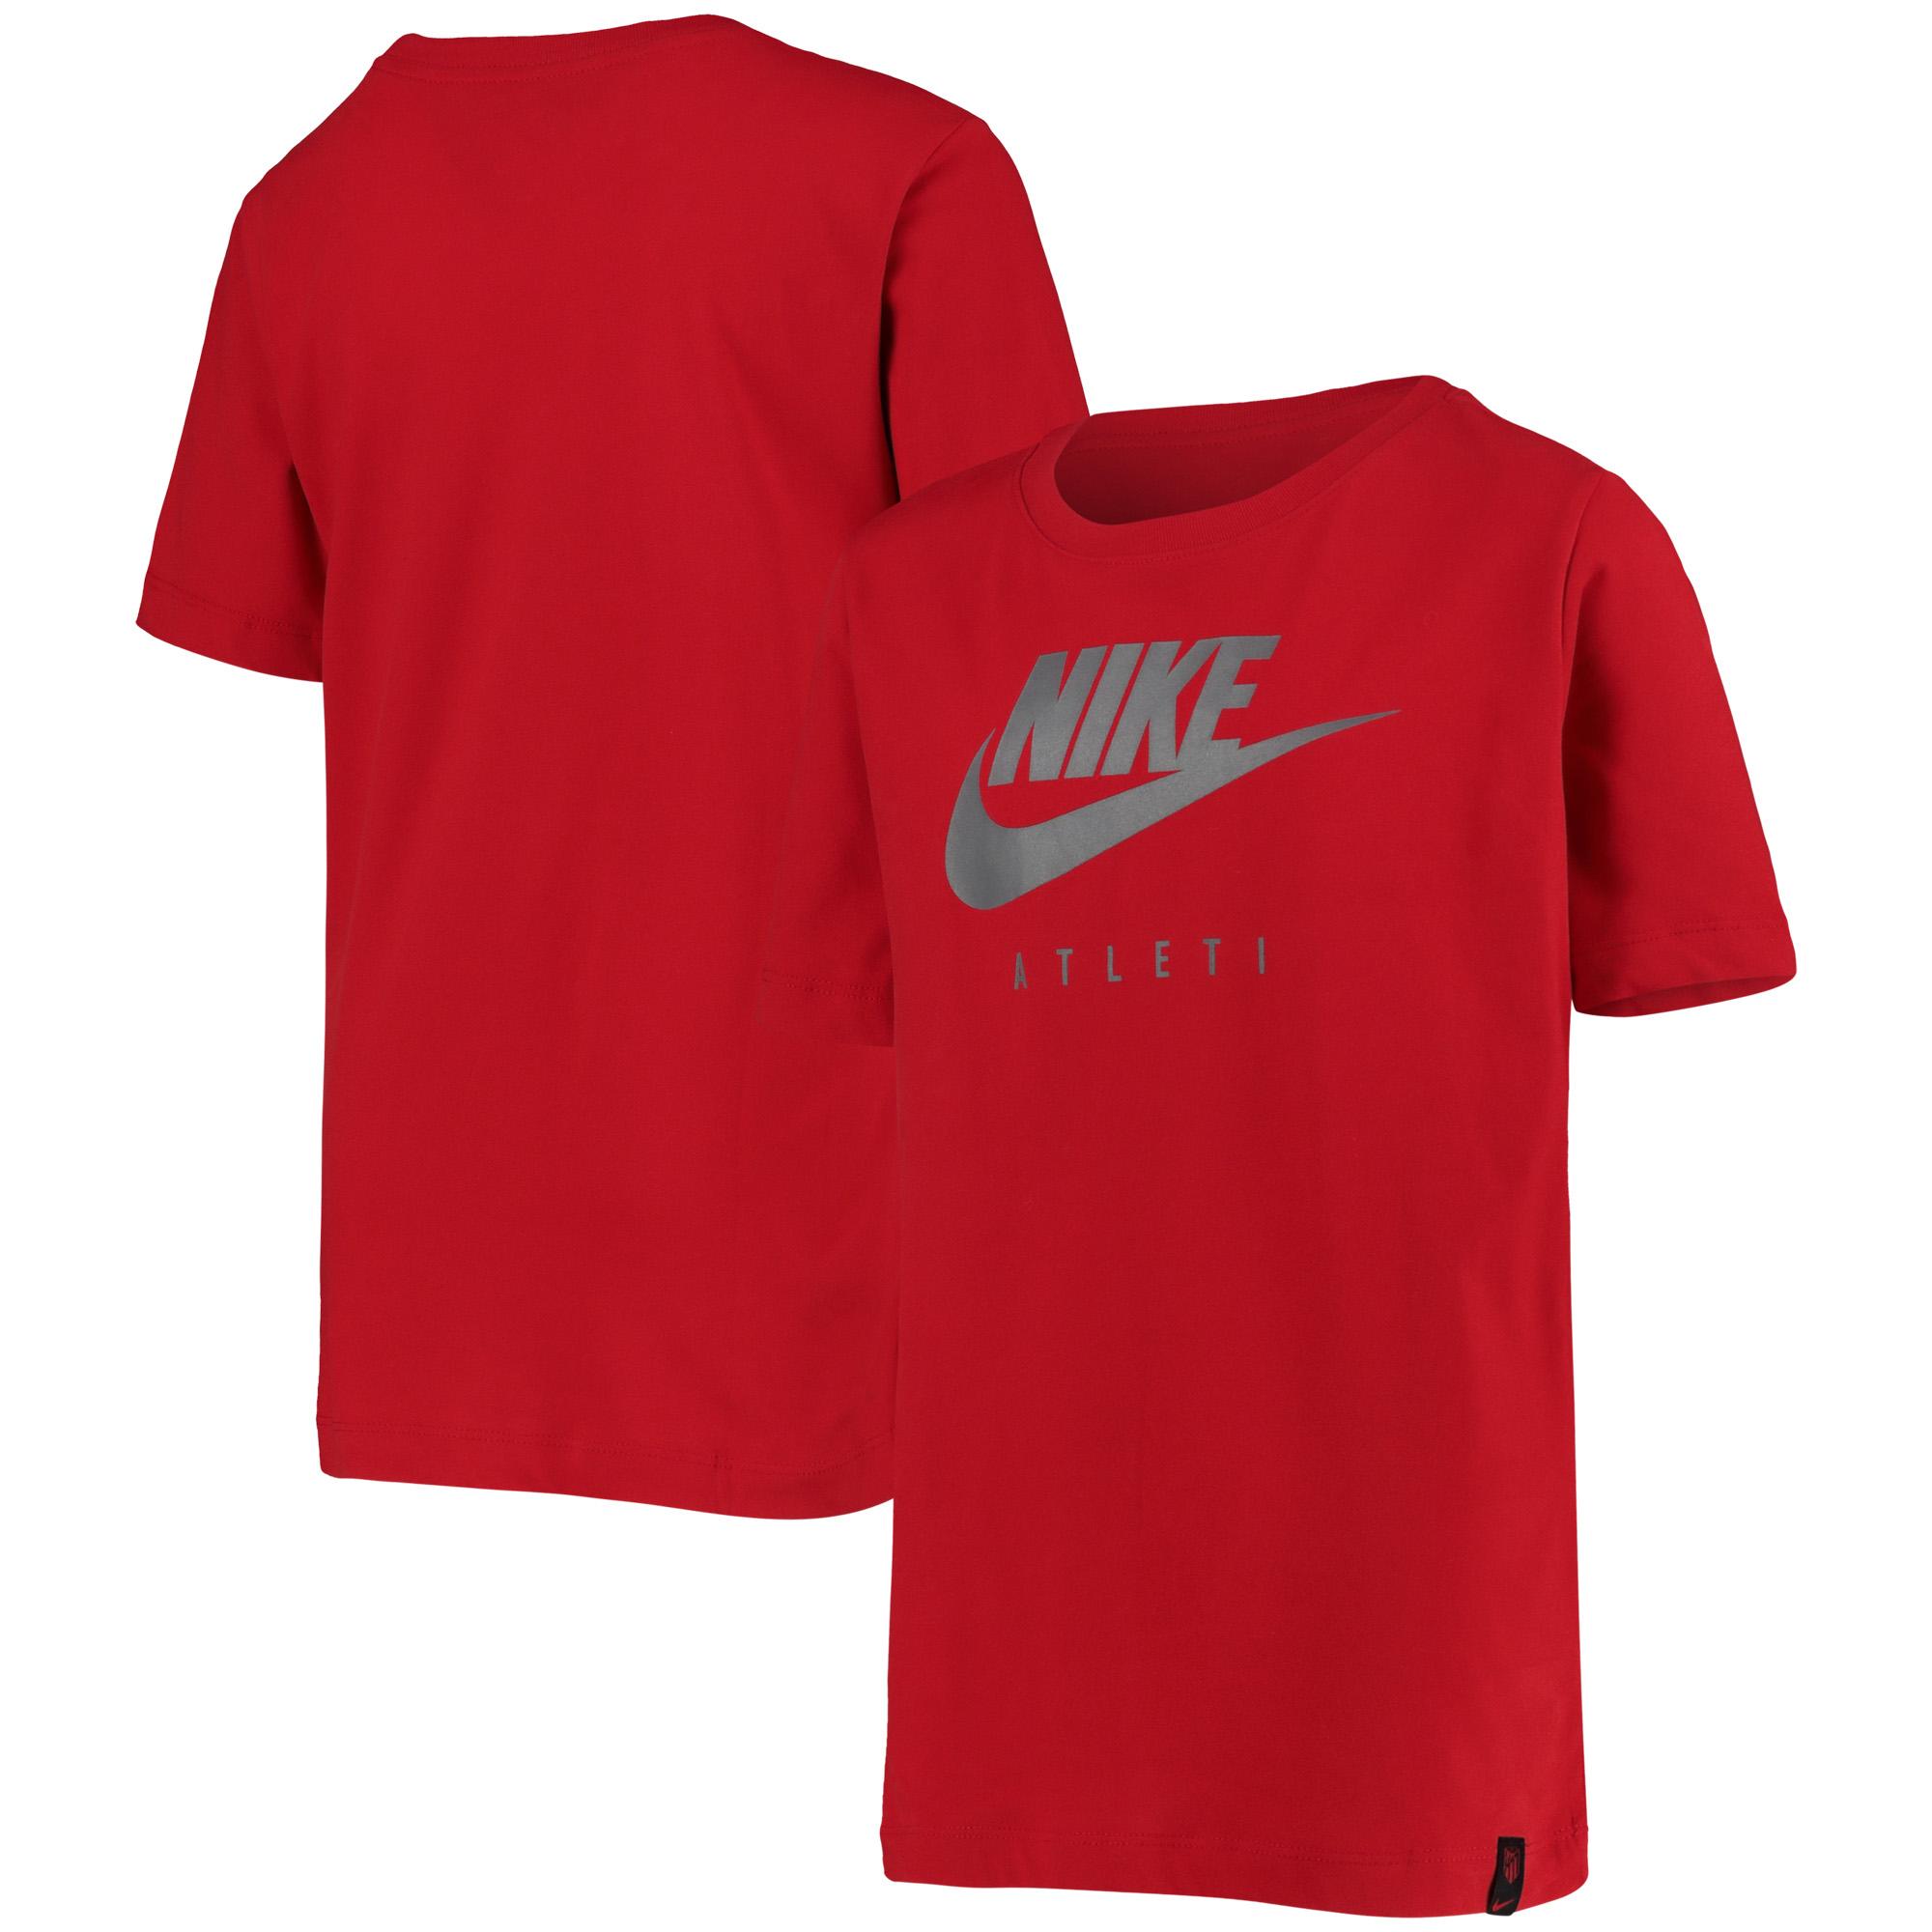 Nike / Camiseta Dry Training Ground del Atlético de Madrid para niño